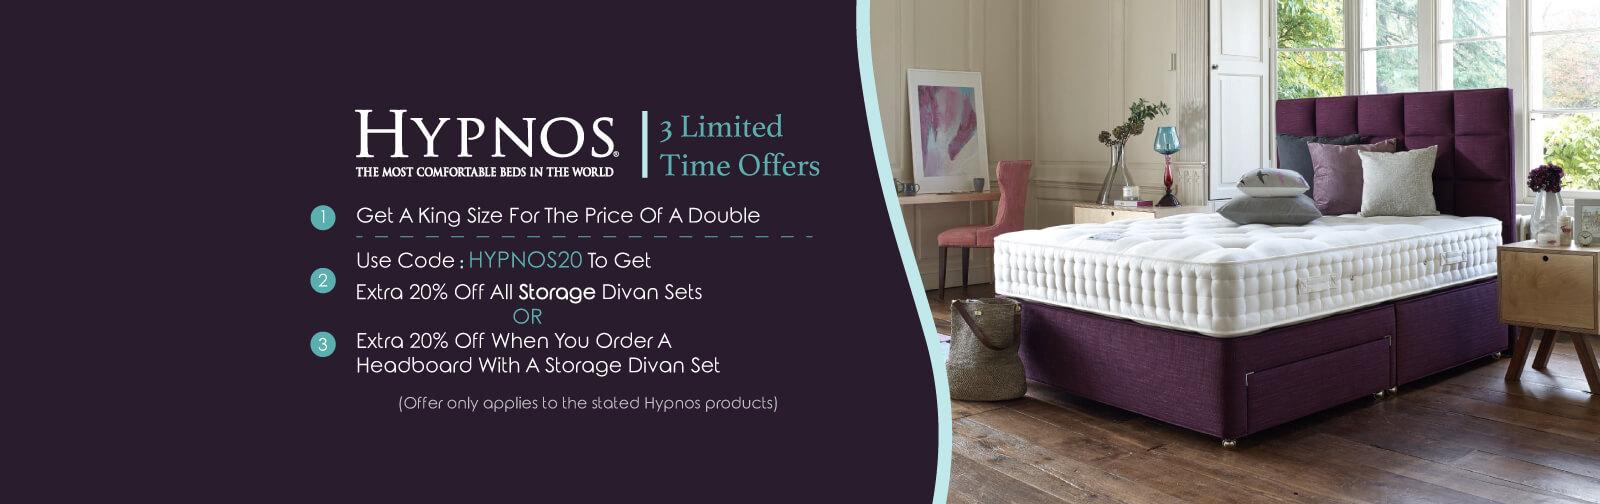 Hypnos offers